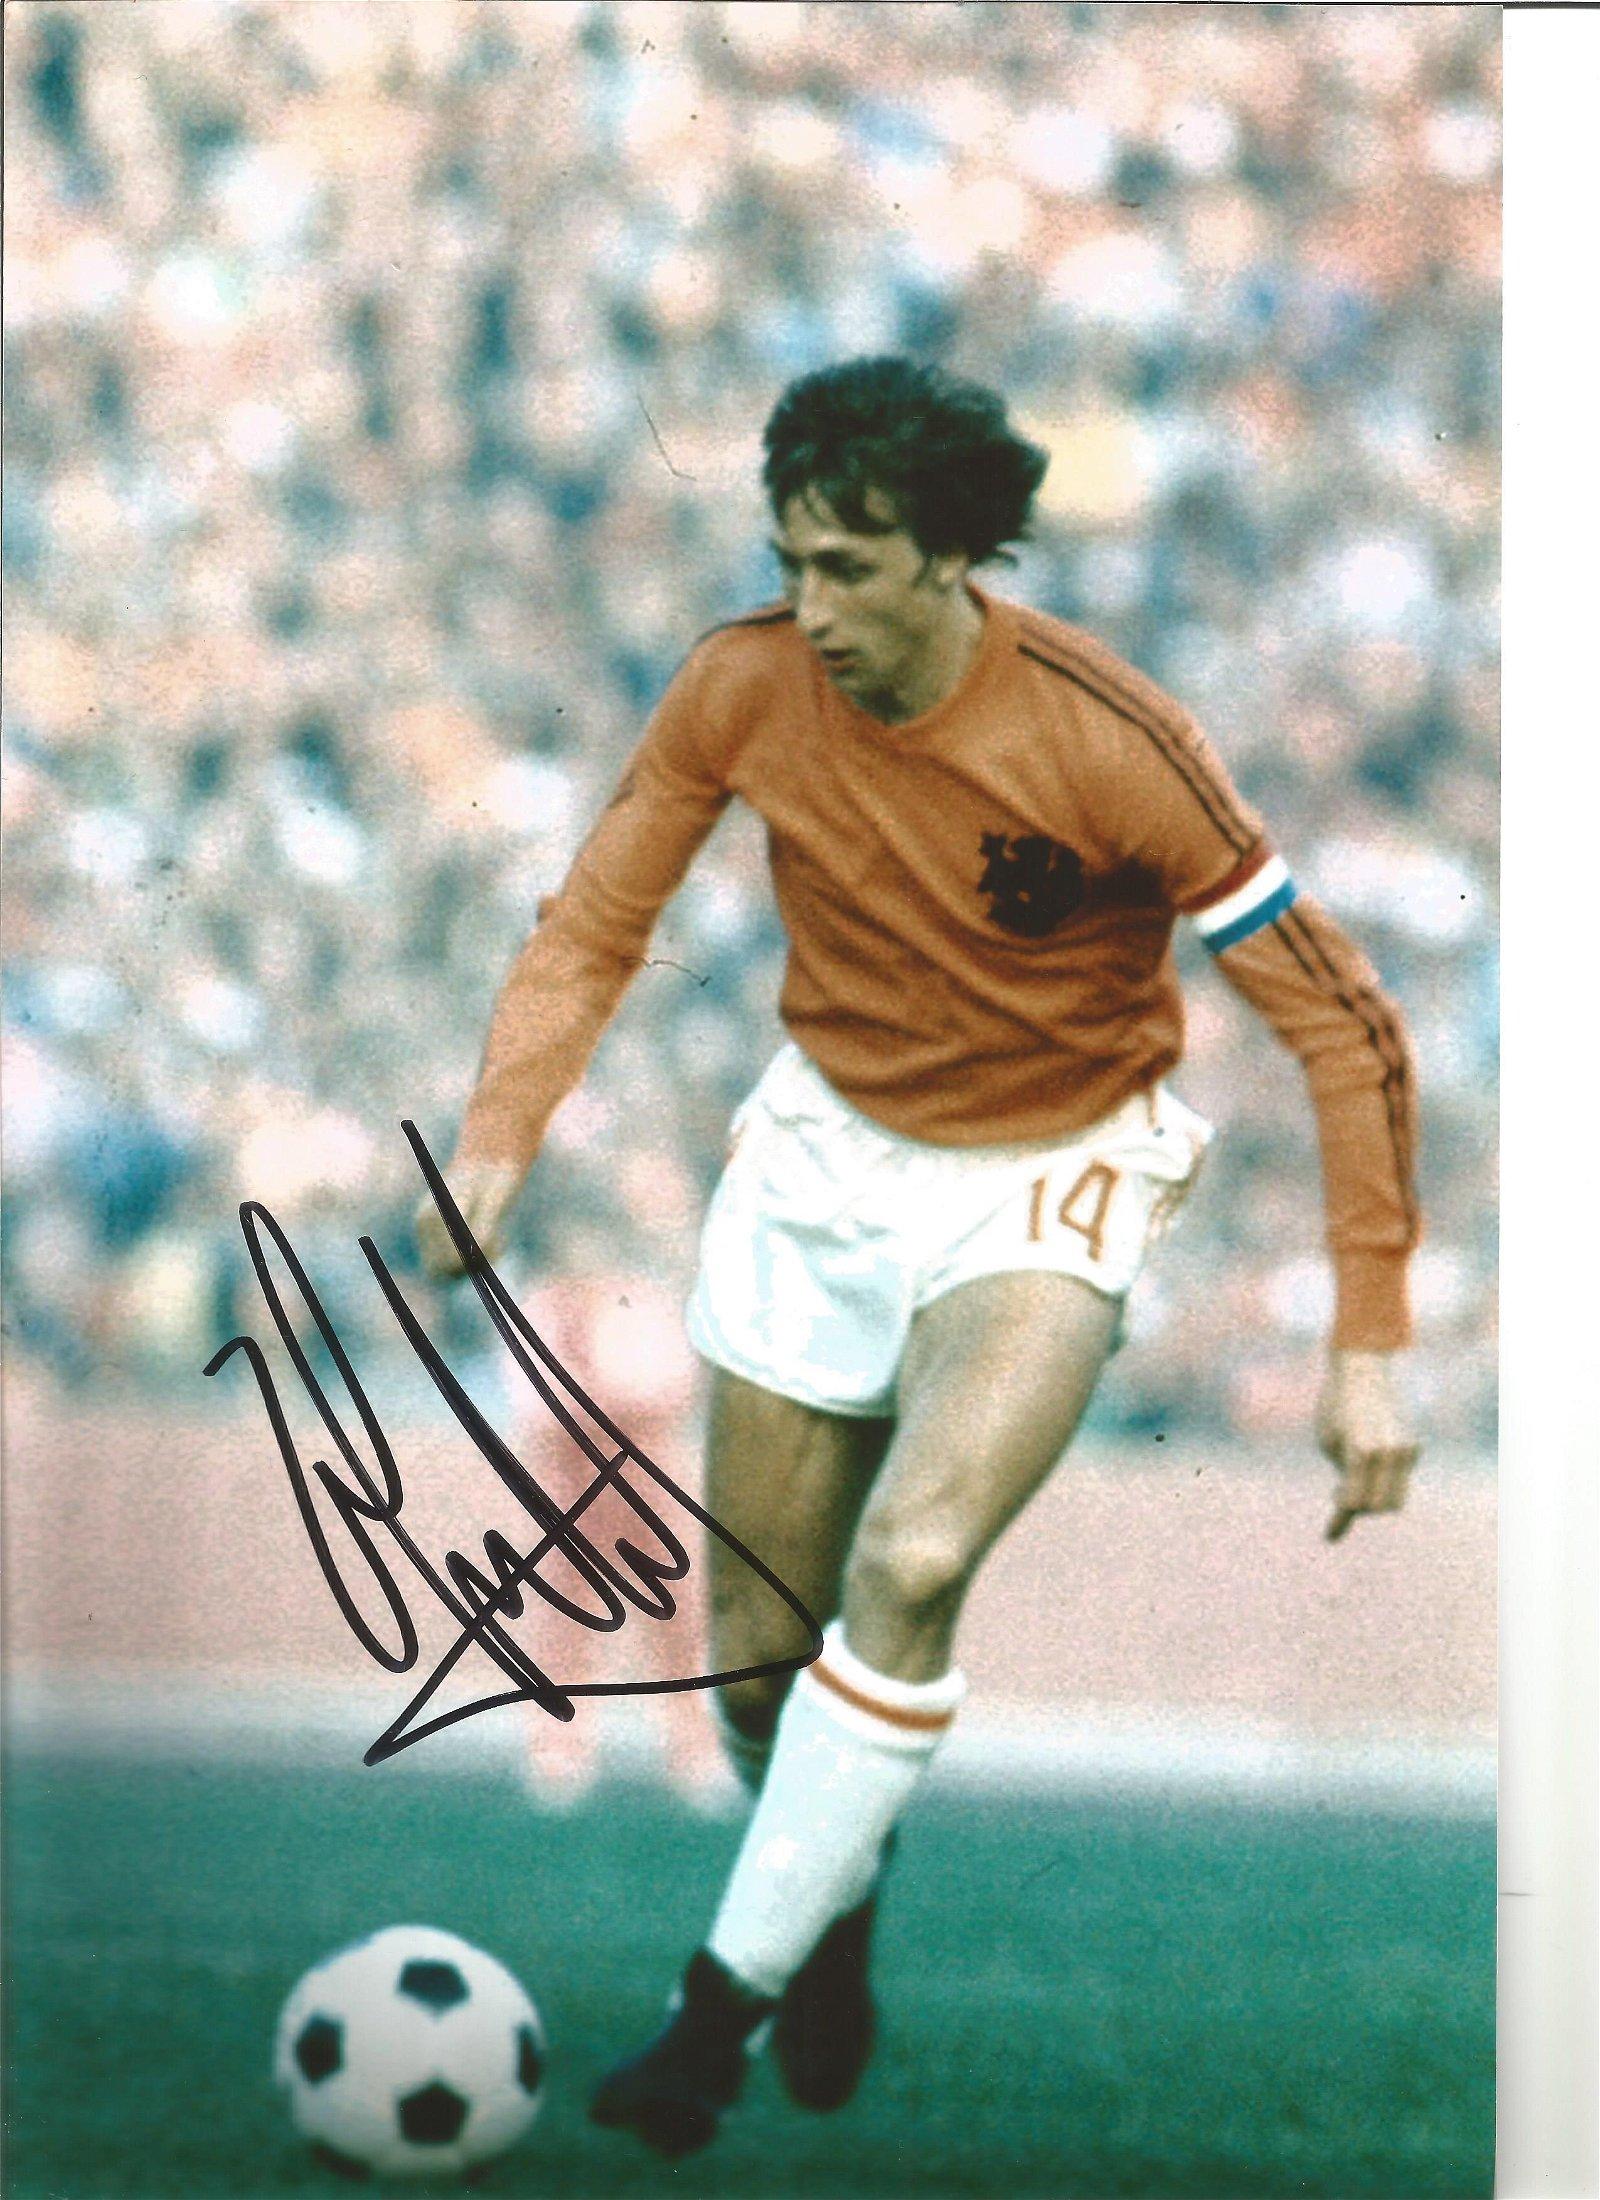 Johan Cruyff Holland Signed 12 x 8 inch football photo.